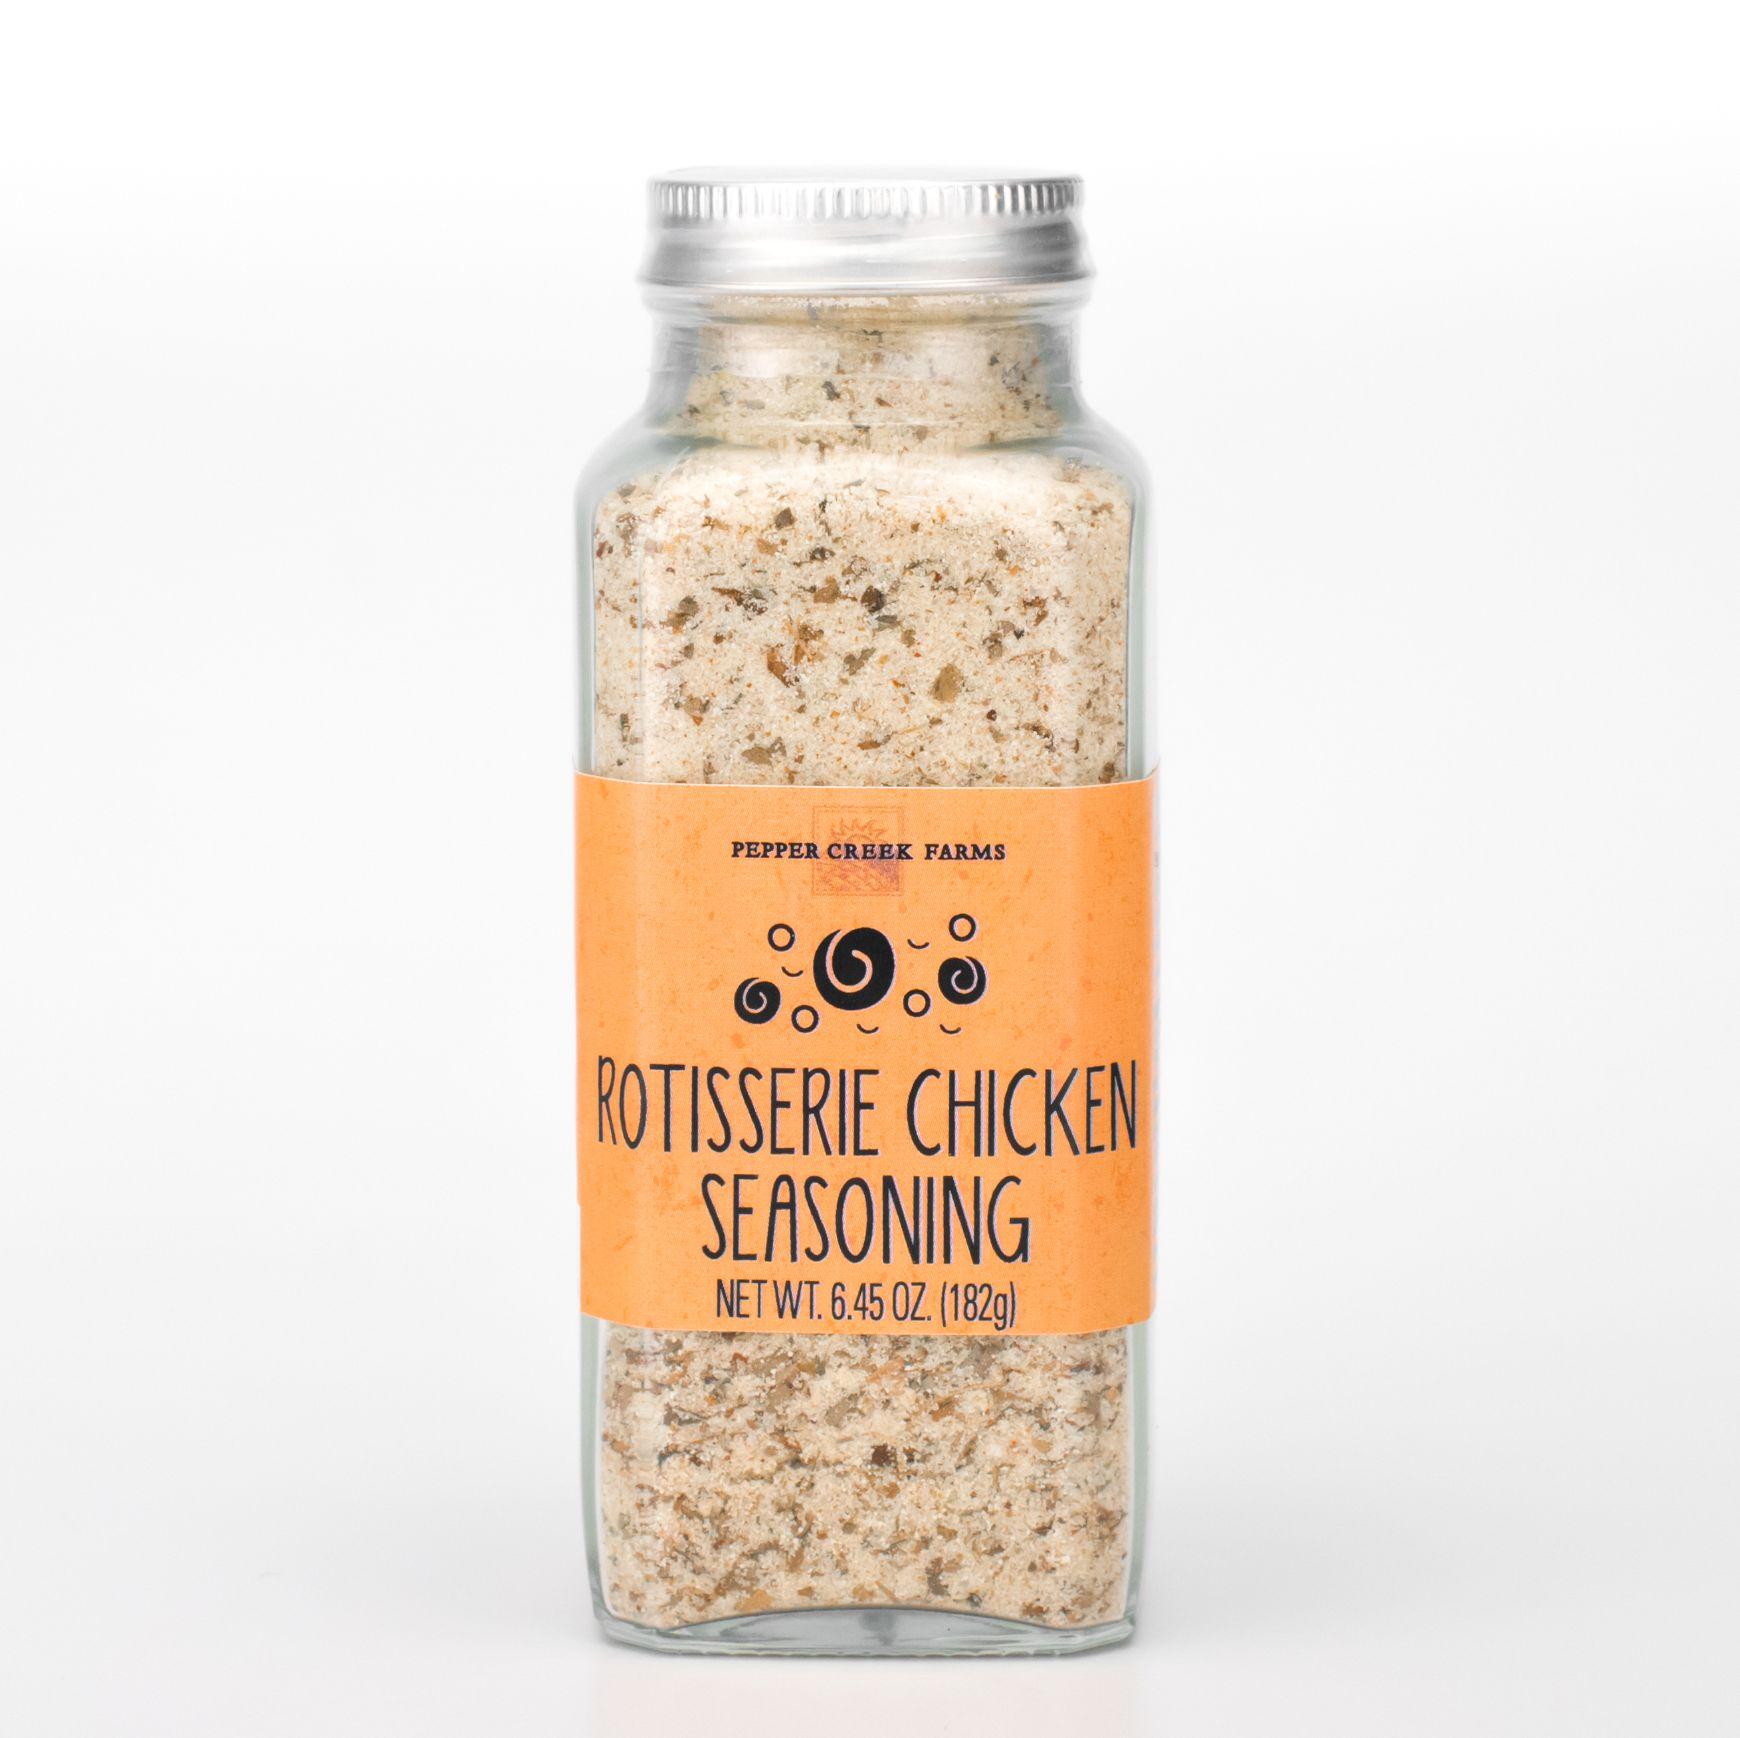 Rotisserie Chicken Seasoning